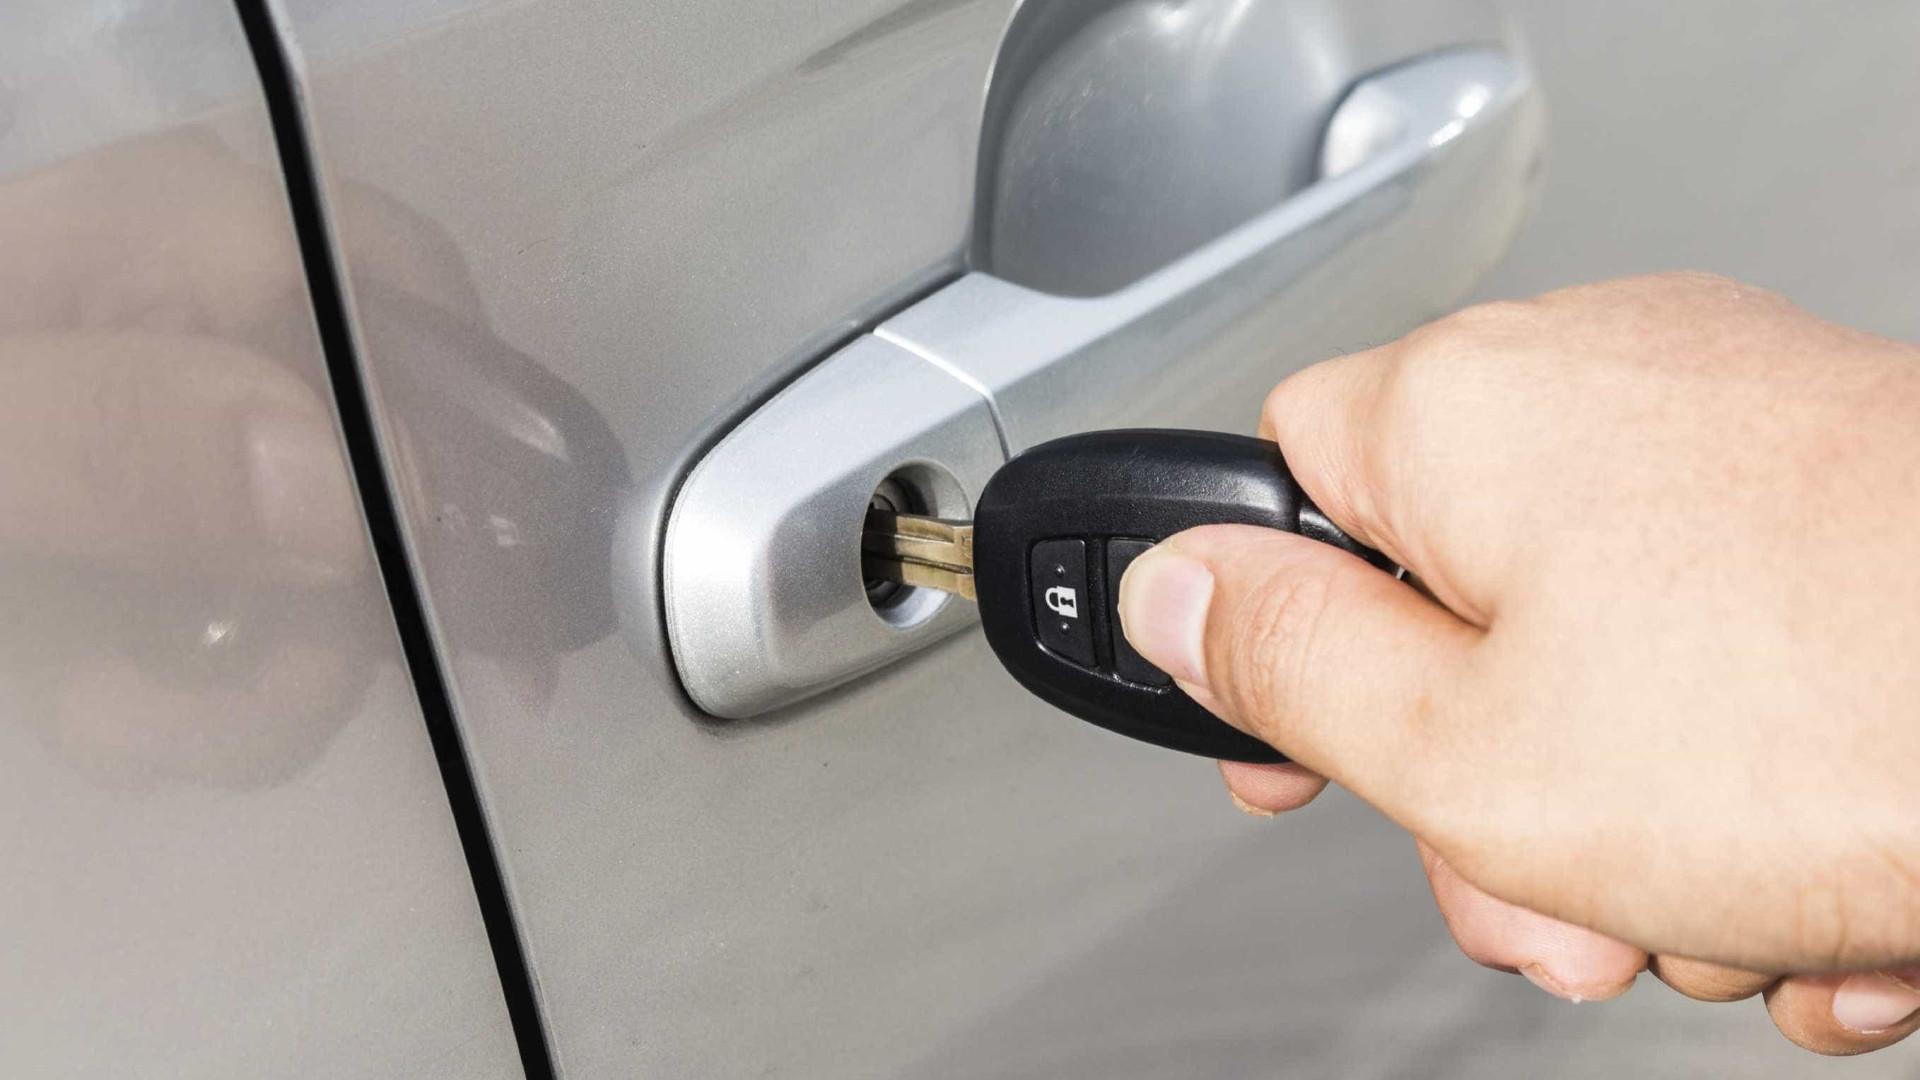 Europcar aposta no low cost através de compra da Goldcar